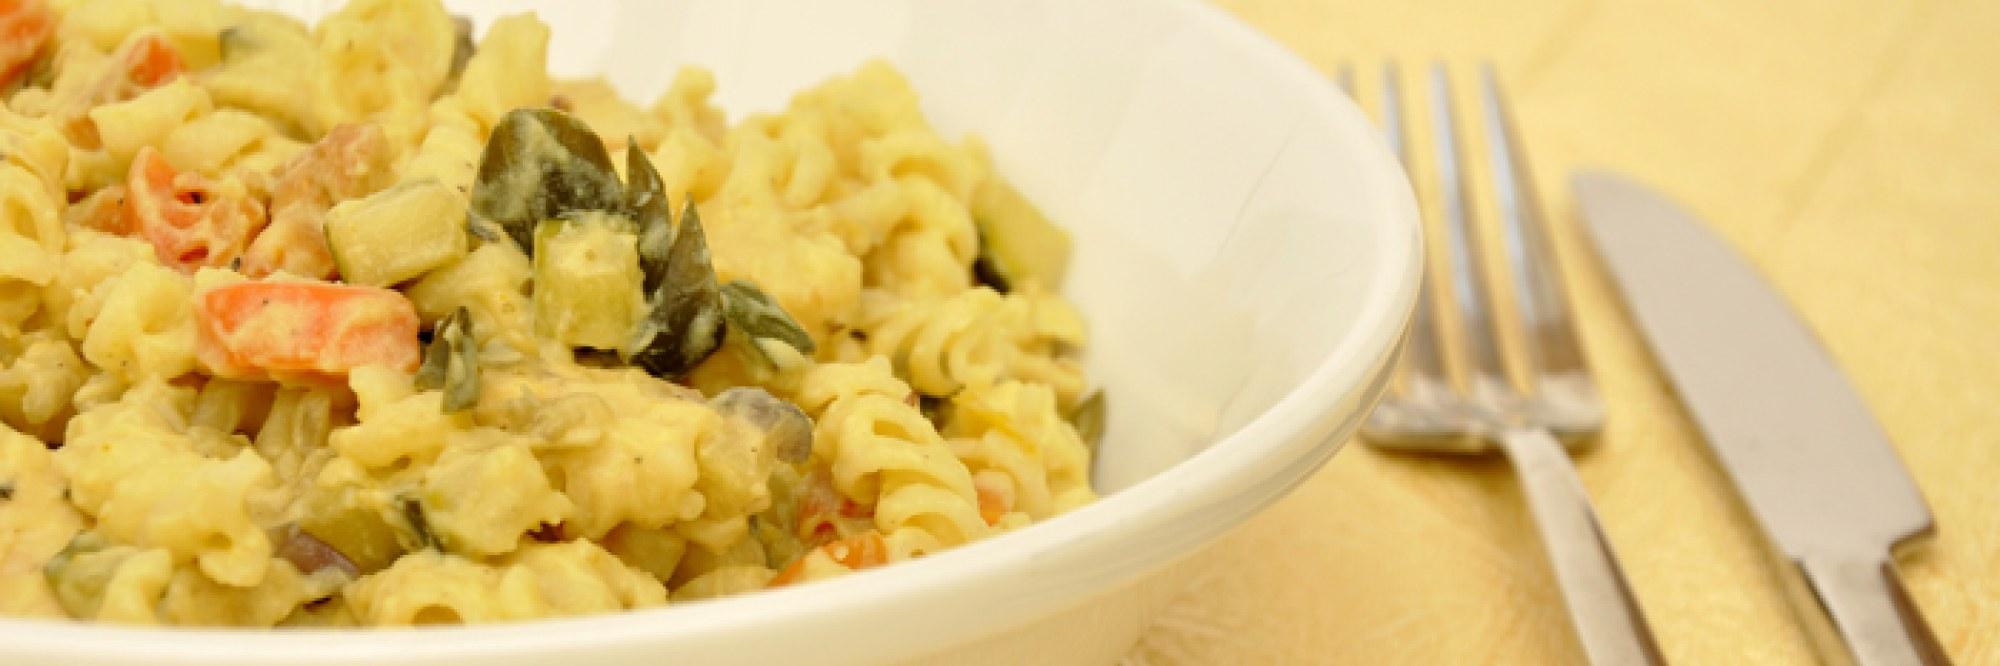 Pasta met tempeh, groenten en 'kaas'saus